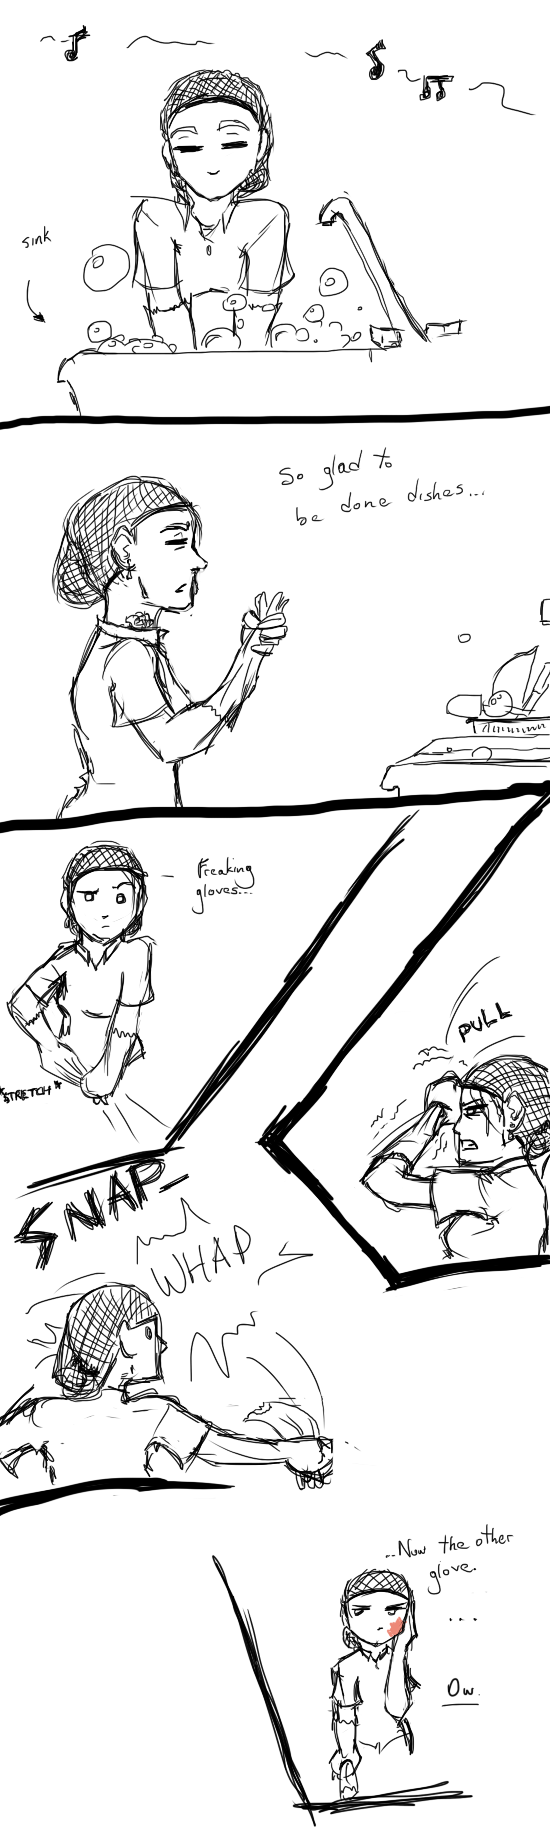 Comic - glove slap by Absolute-Sero